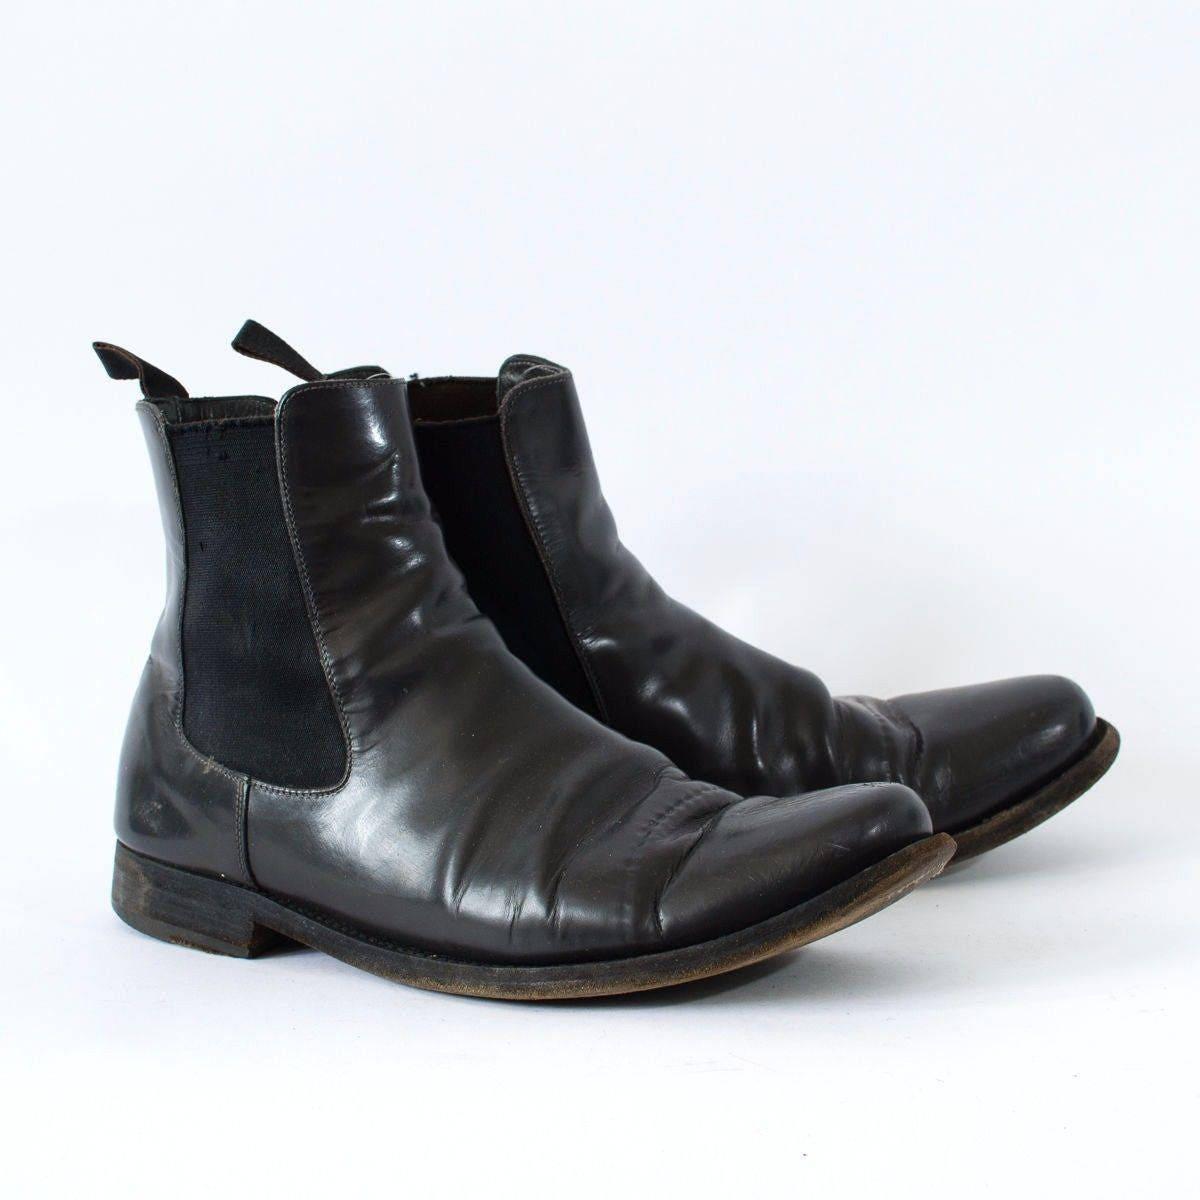 Vintage Black Real Leather Chelsea Boots Festival Mens UK 9 EU 43 US 10